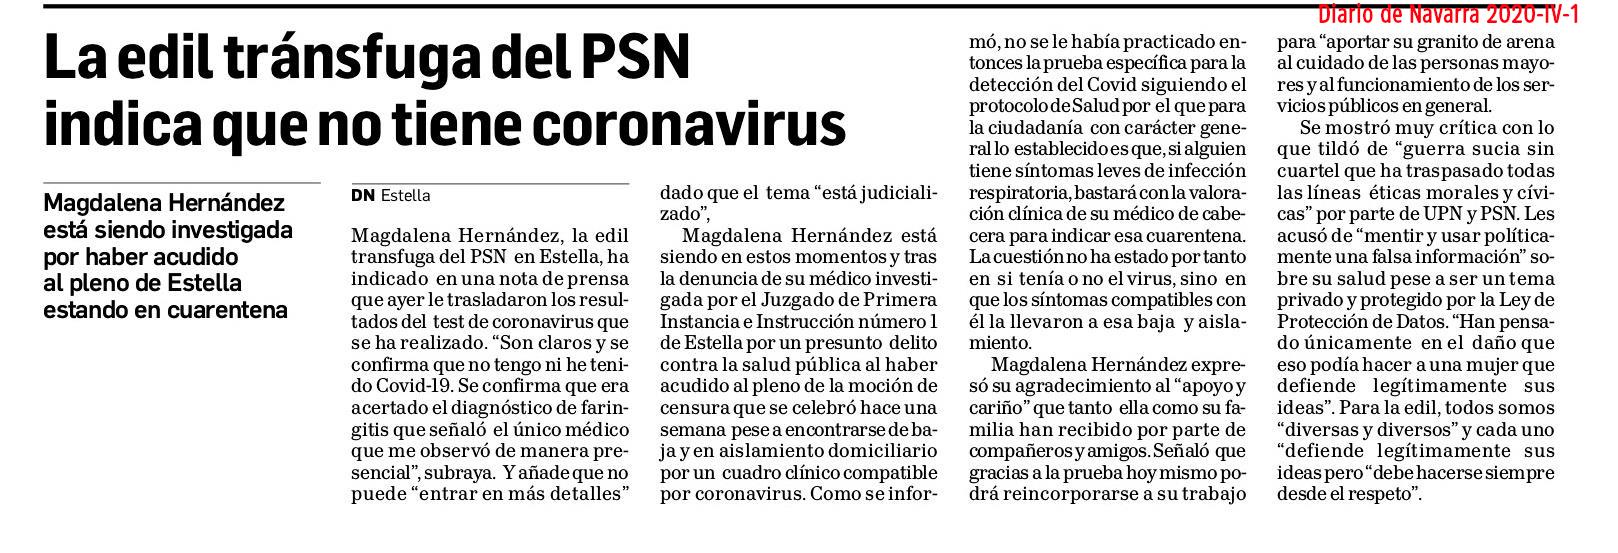 Diario de Navarra ni informa ni rectifica